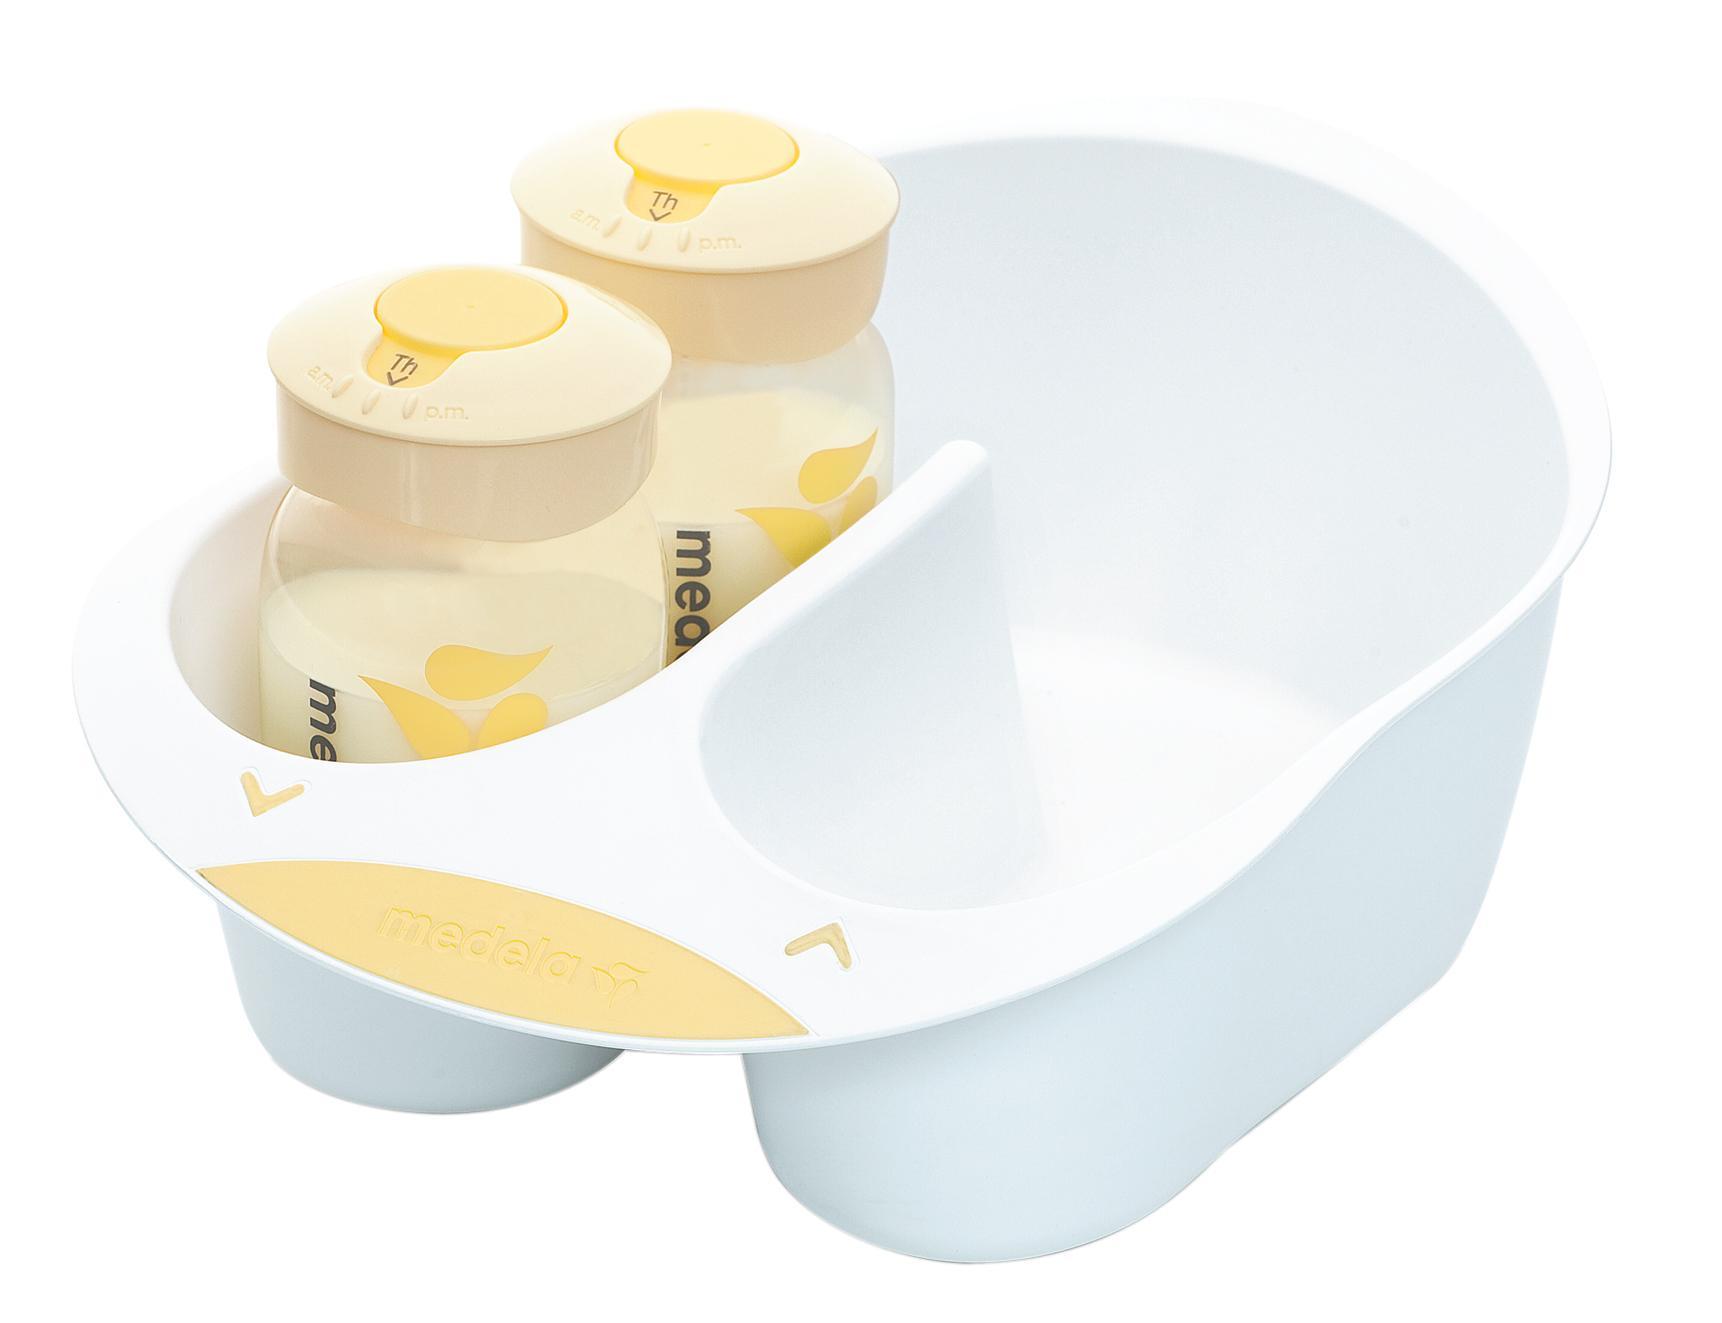 e56cf8136a64 Amazon.com : Medela Breast Milk Storage Solution Set : Breast Milk ...